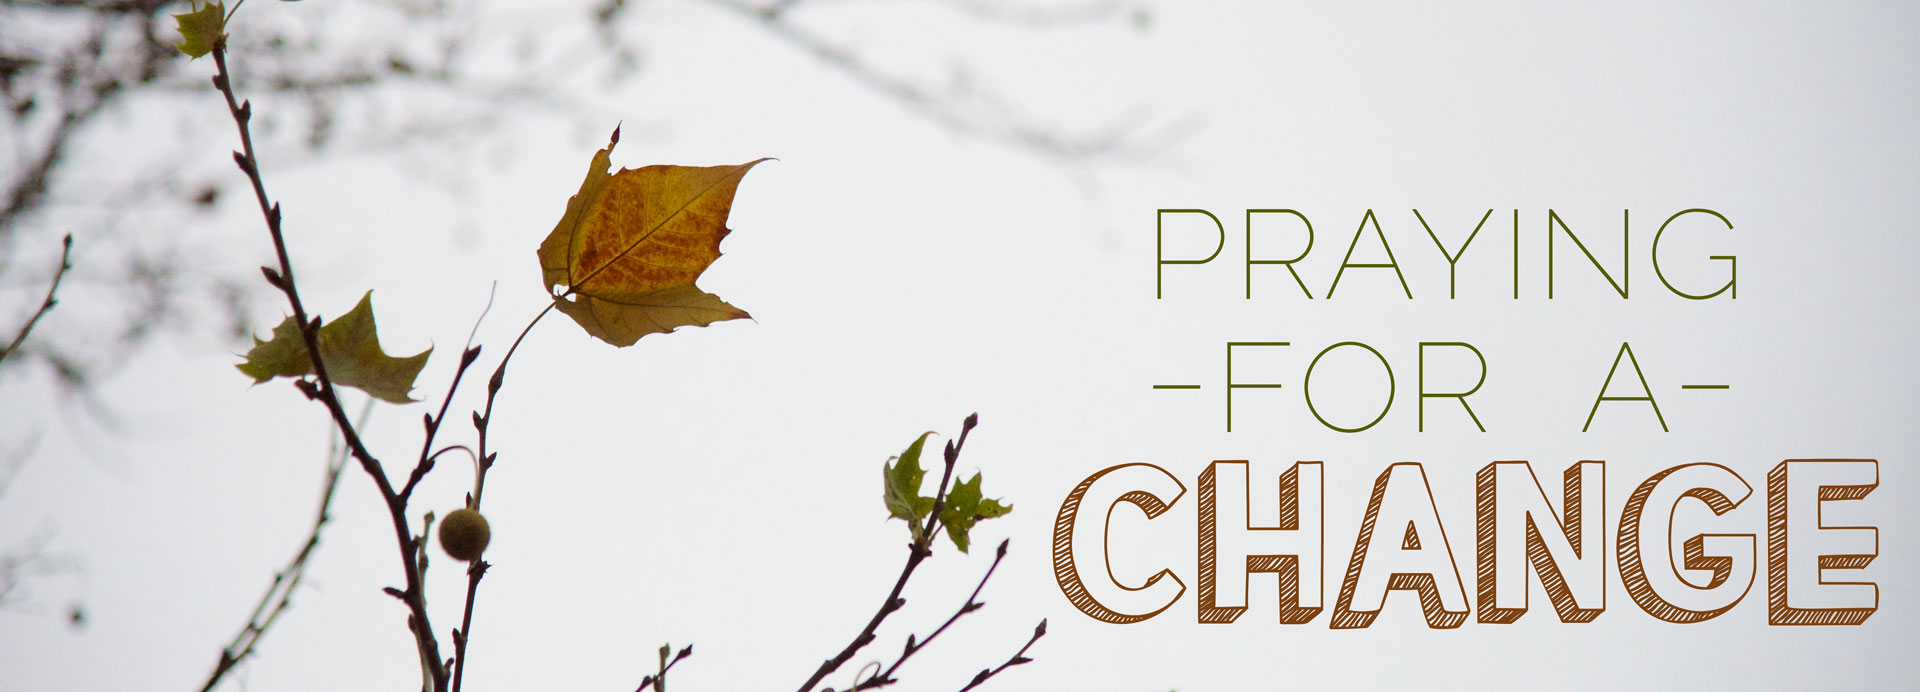 Praying-for-Change-Leaf-1920x692.jpg